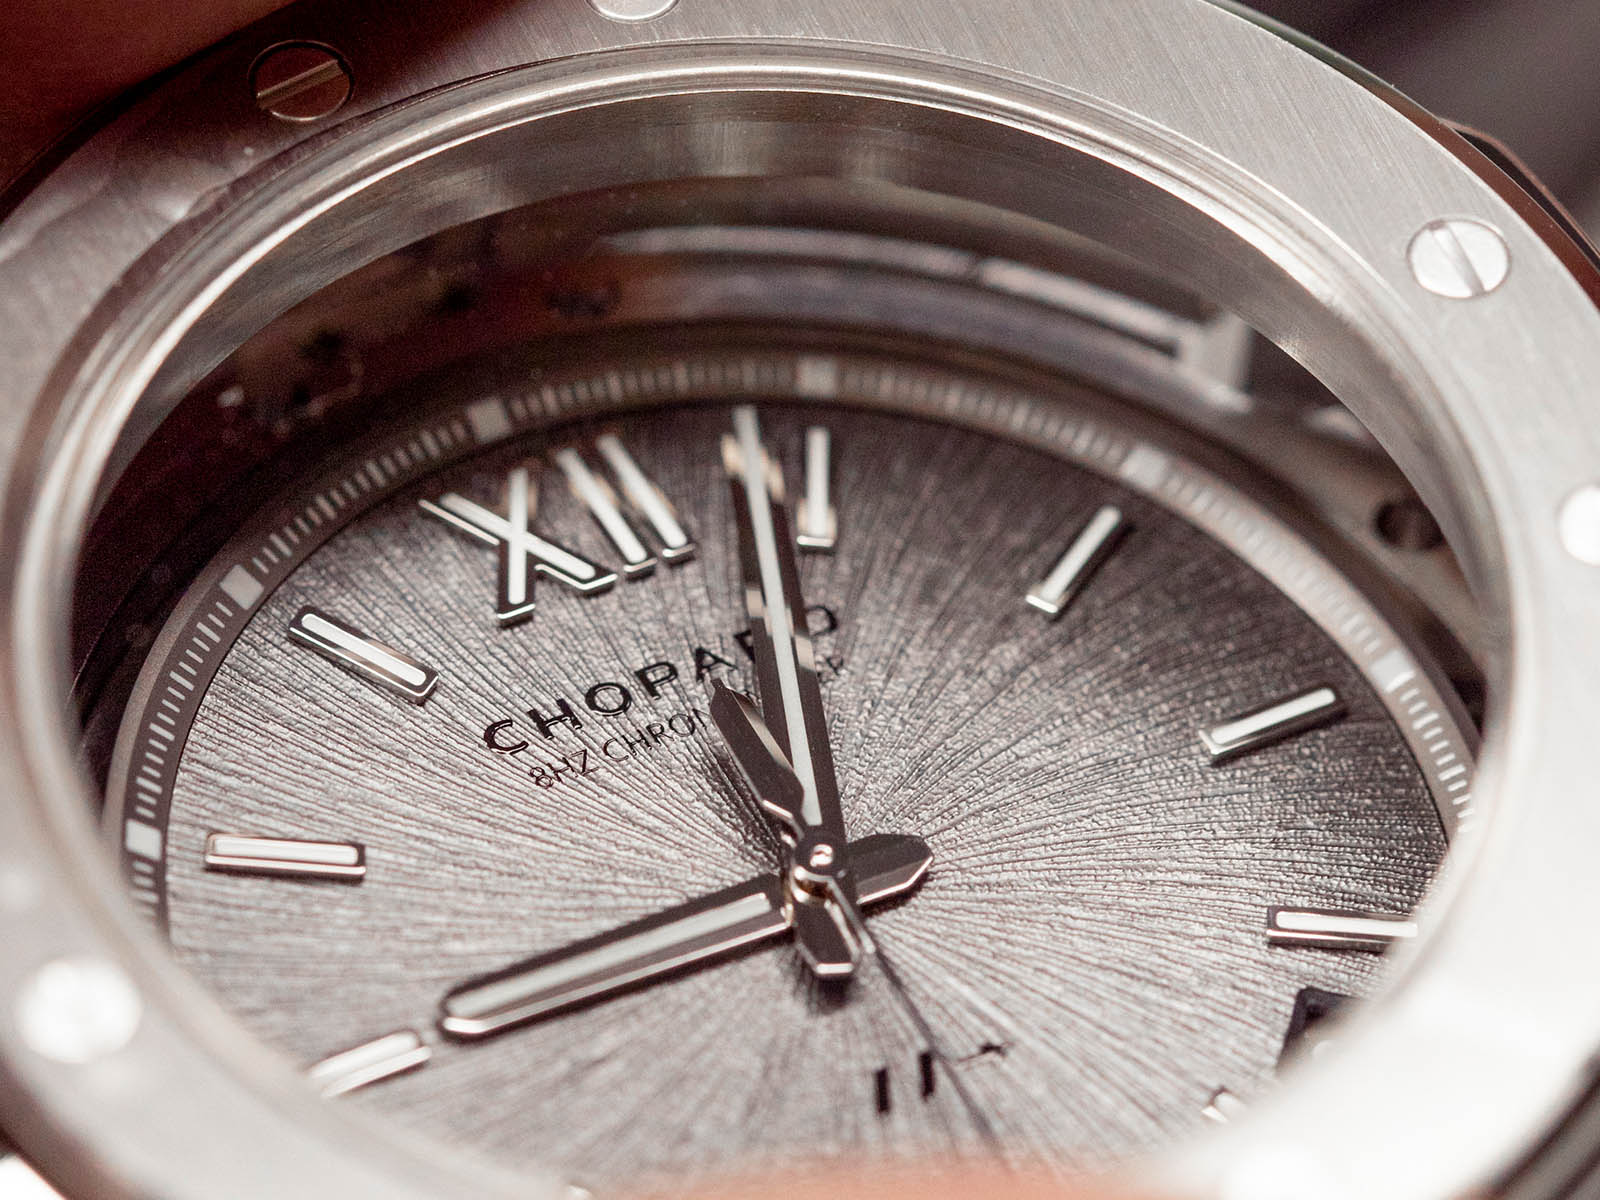 298600-3005-chopard-alpine-eagle-cadence-8hf-titanium-4.jpg